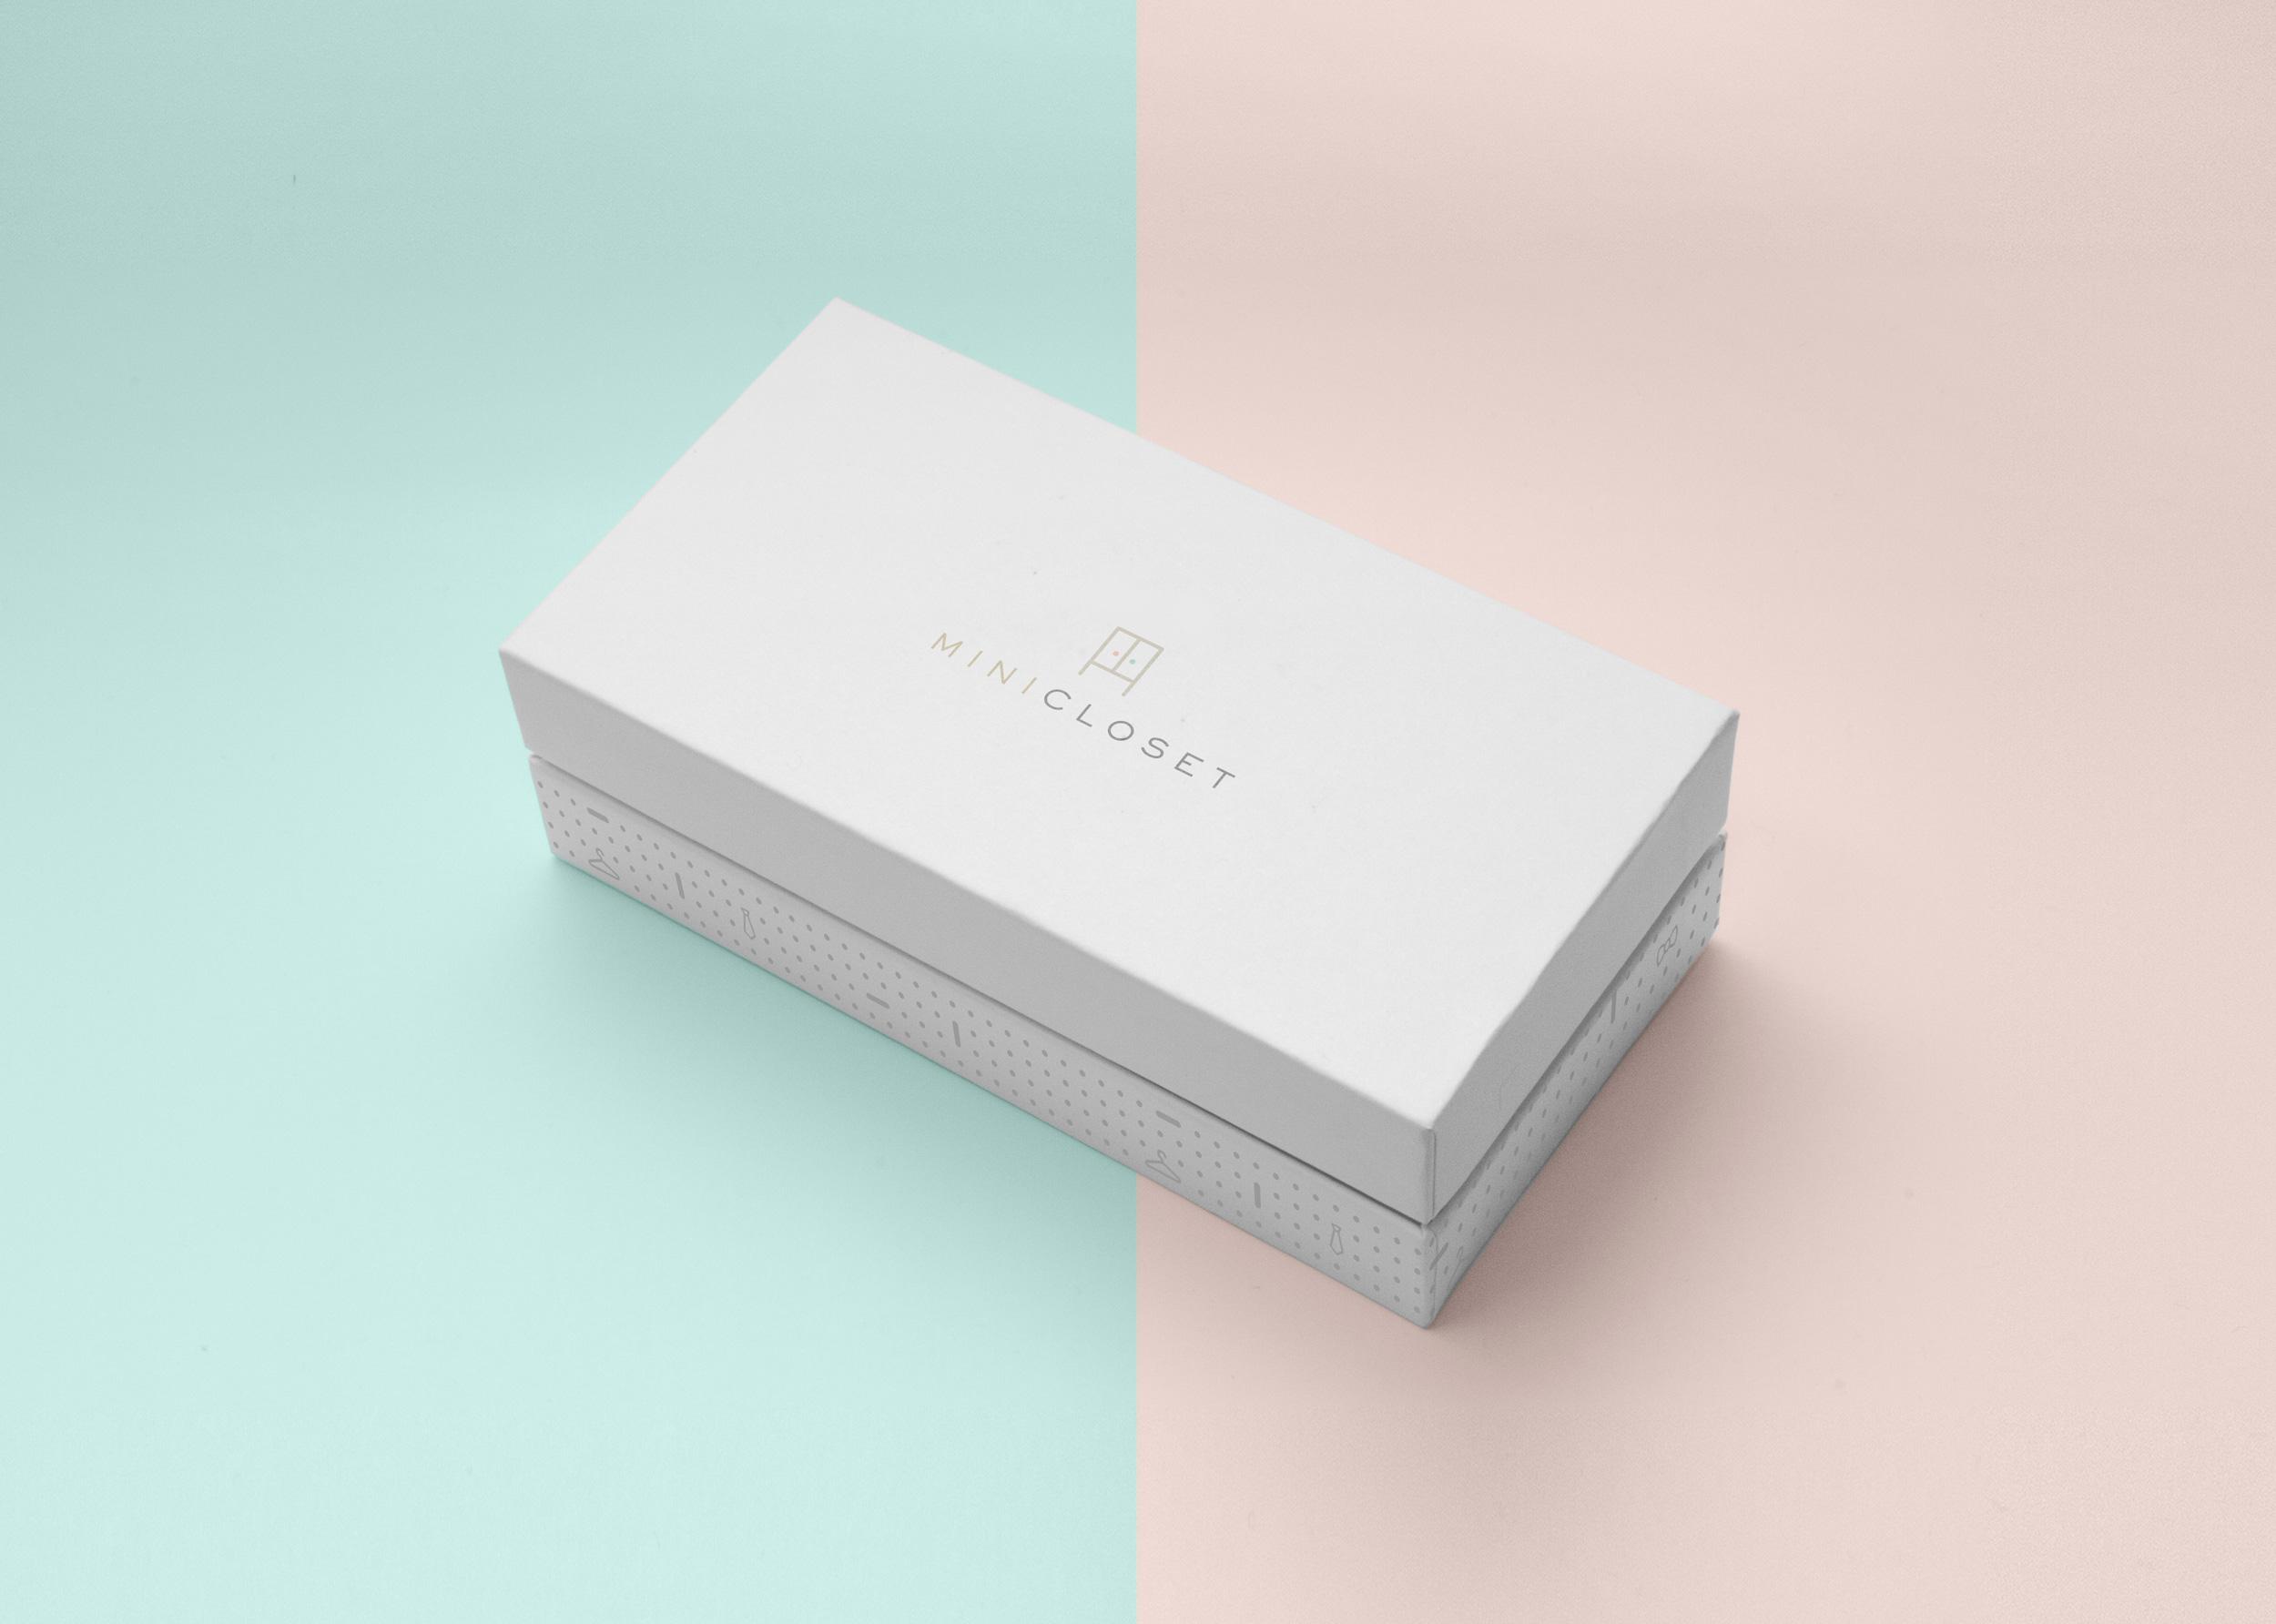 daniel-zito-mini-closet-cartao-design-grafico-caixa.jpg